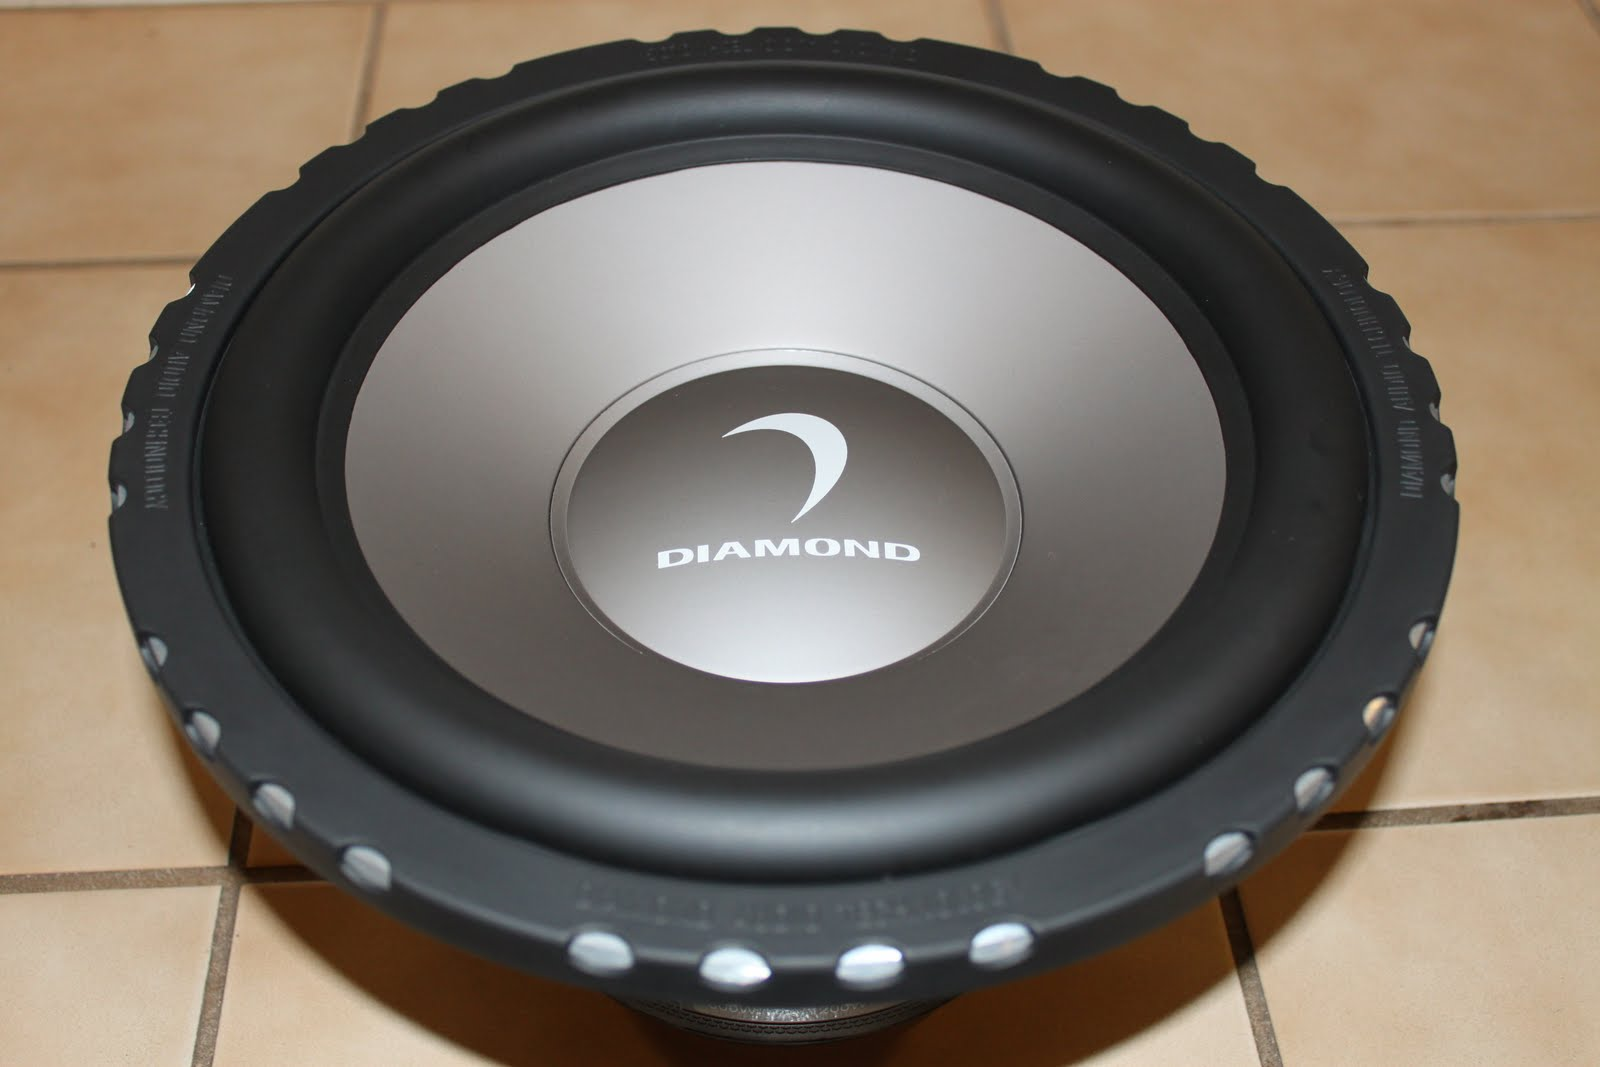 diamond monster sound mx300 sound card pci скачать драйвер